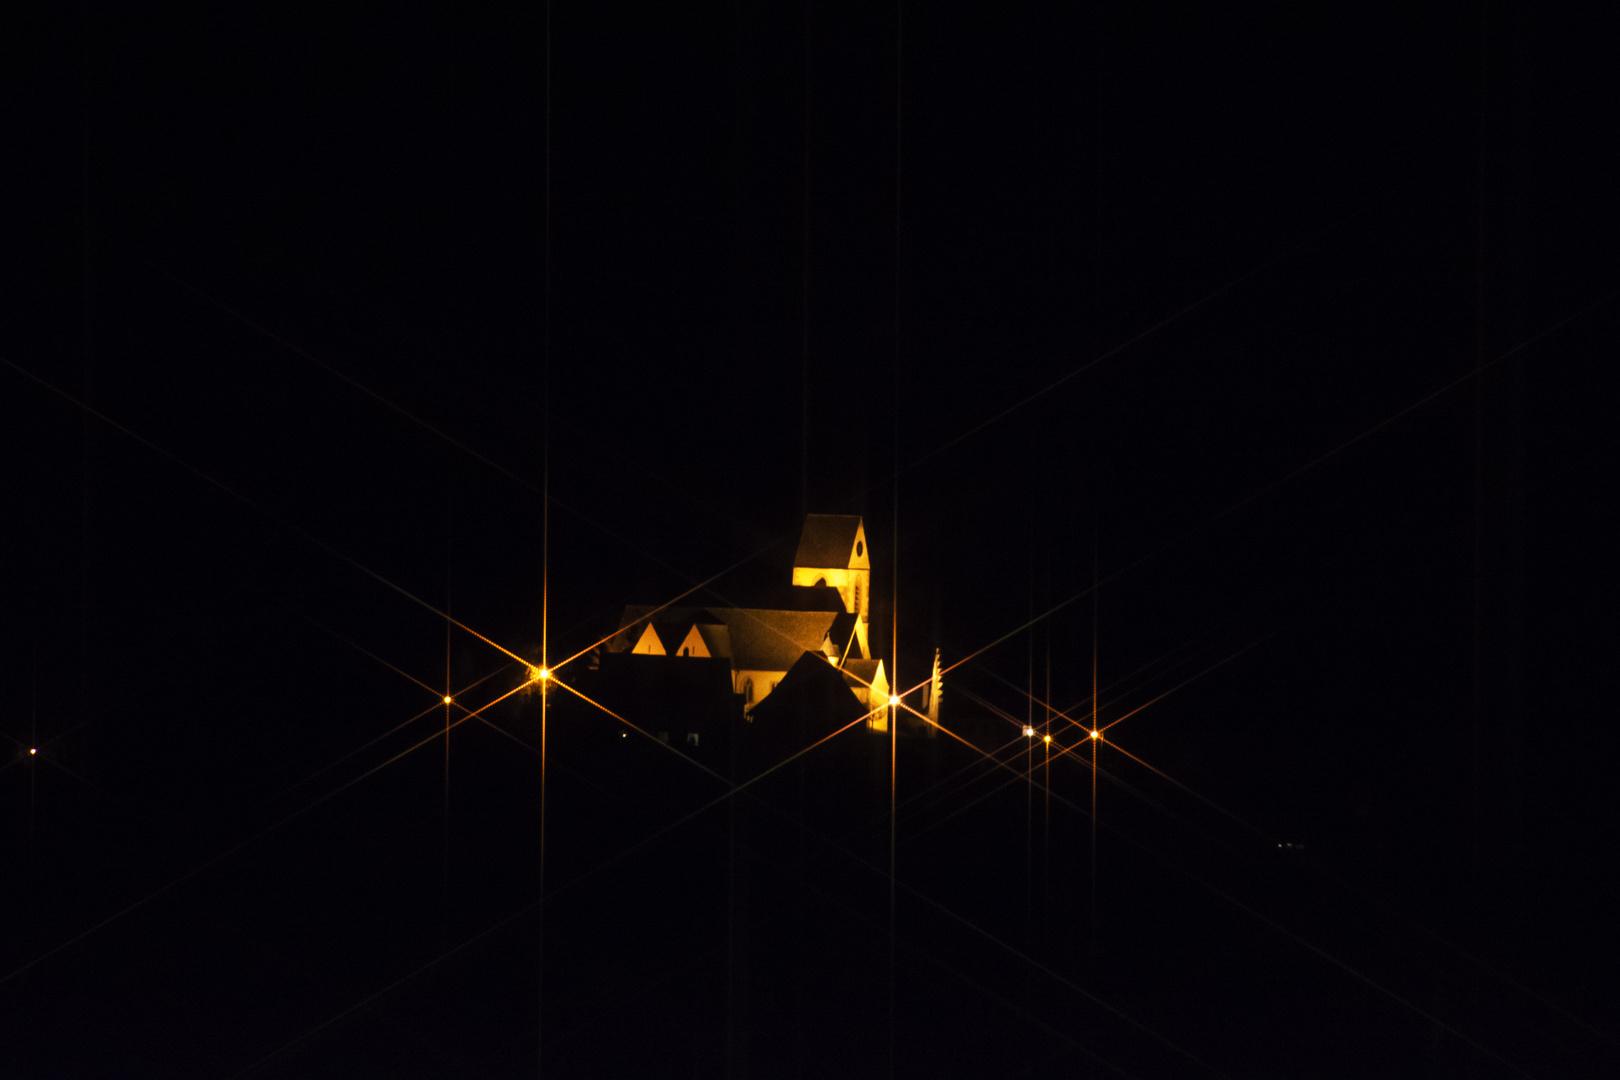 Röttler Kirche by Night